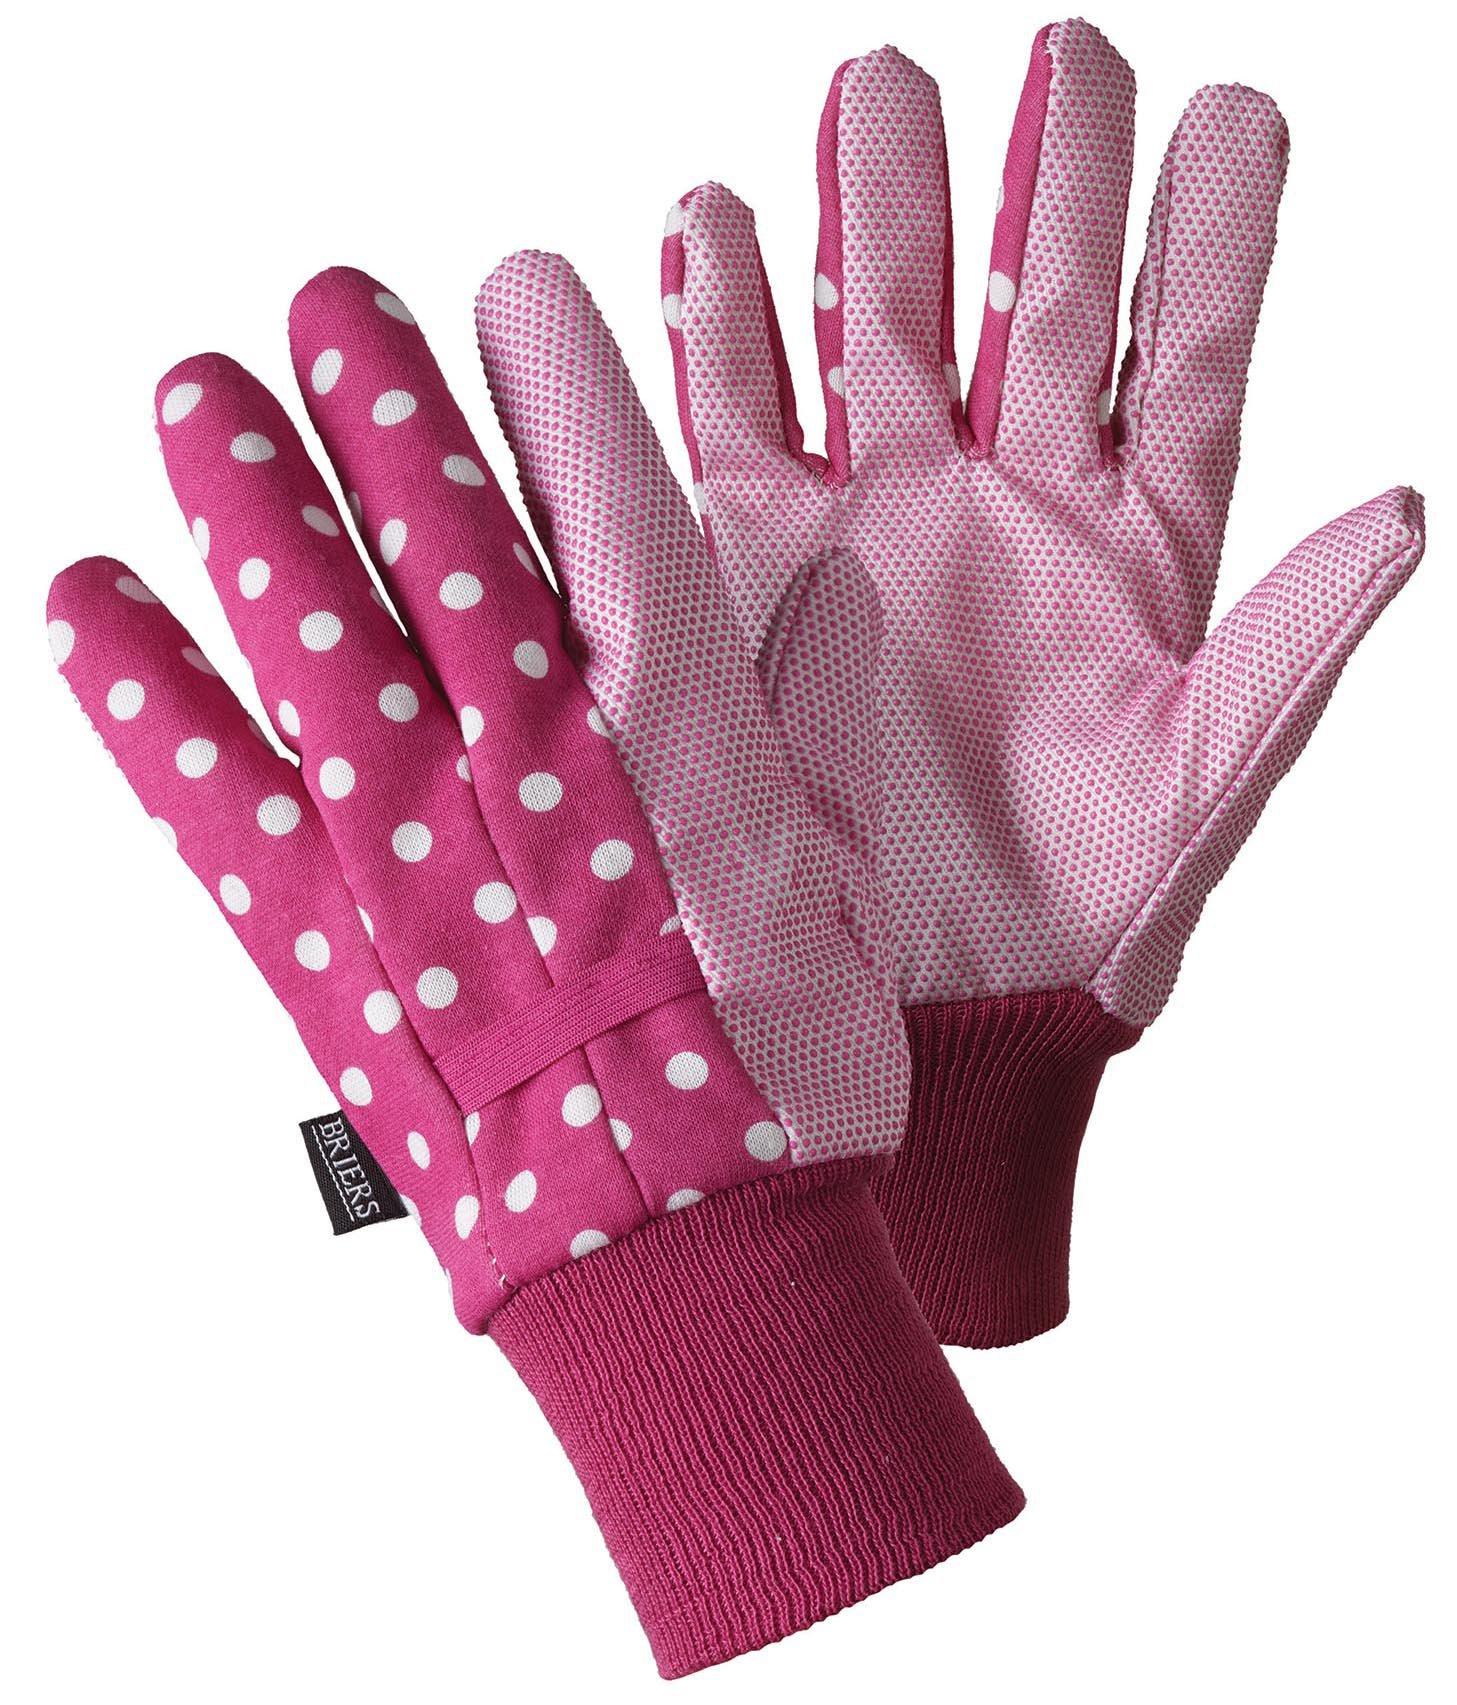 Briers Spots Water Repellent Gardening Gloves Medium at